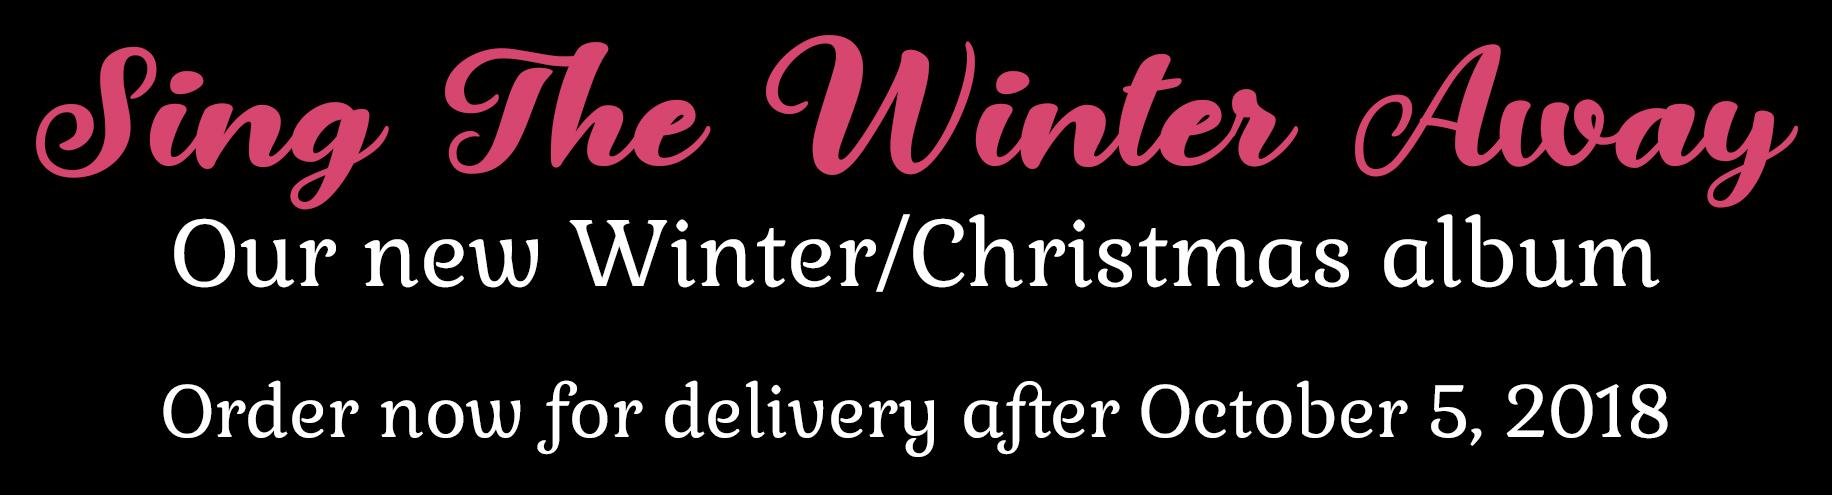 Winter-promo-banner2